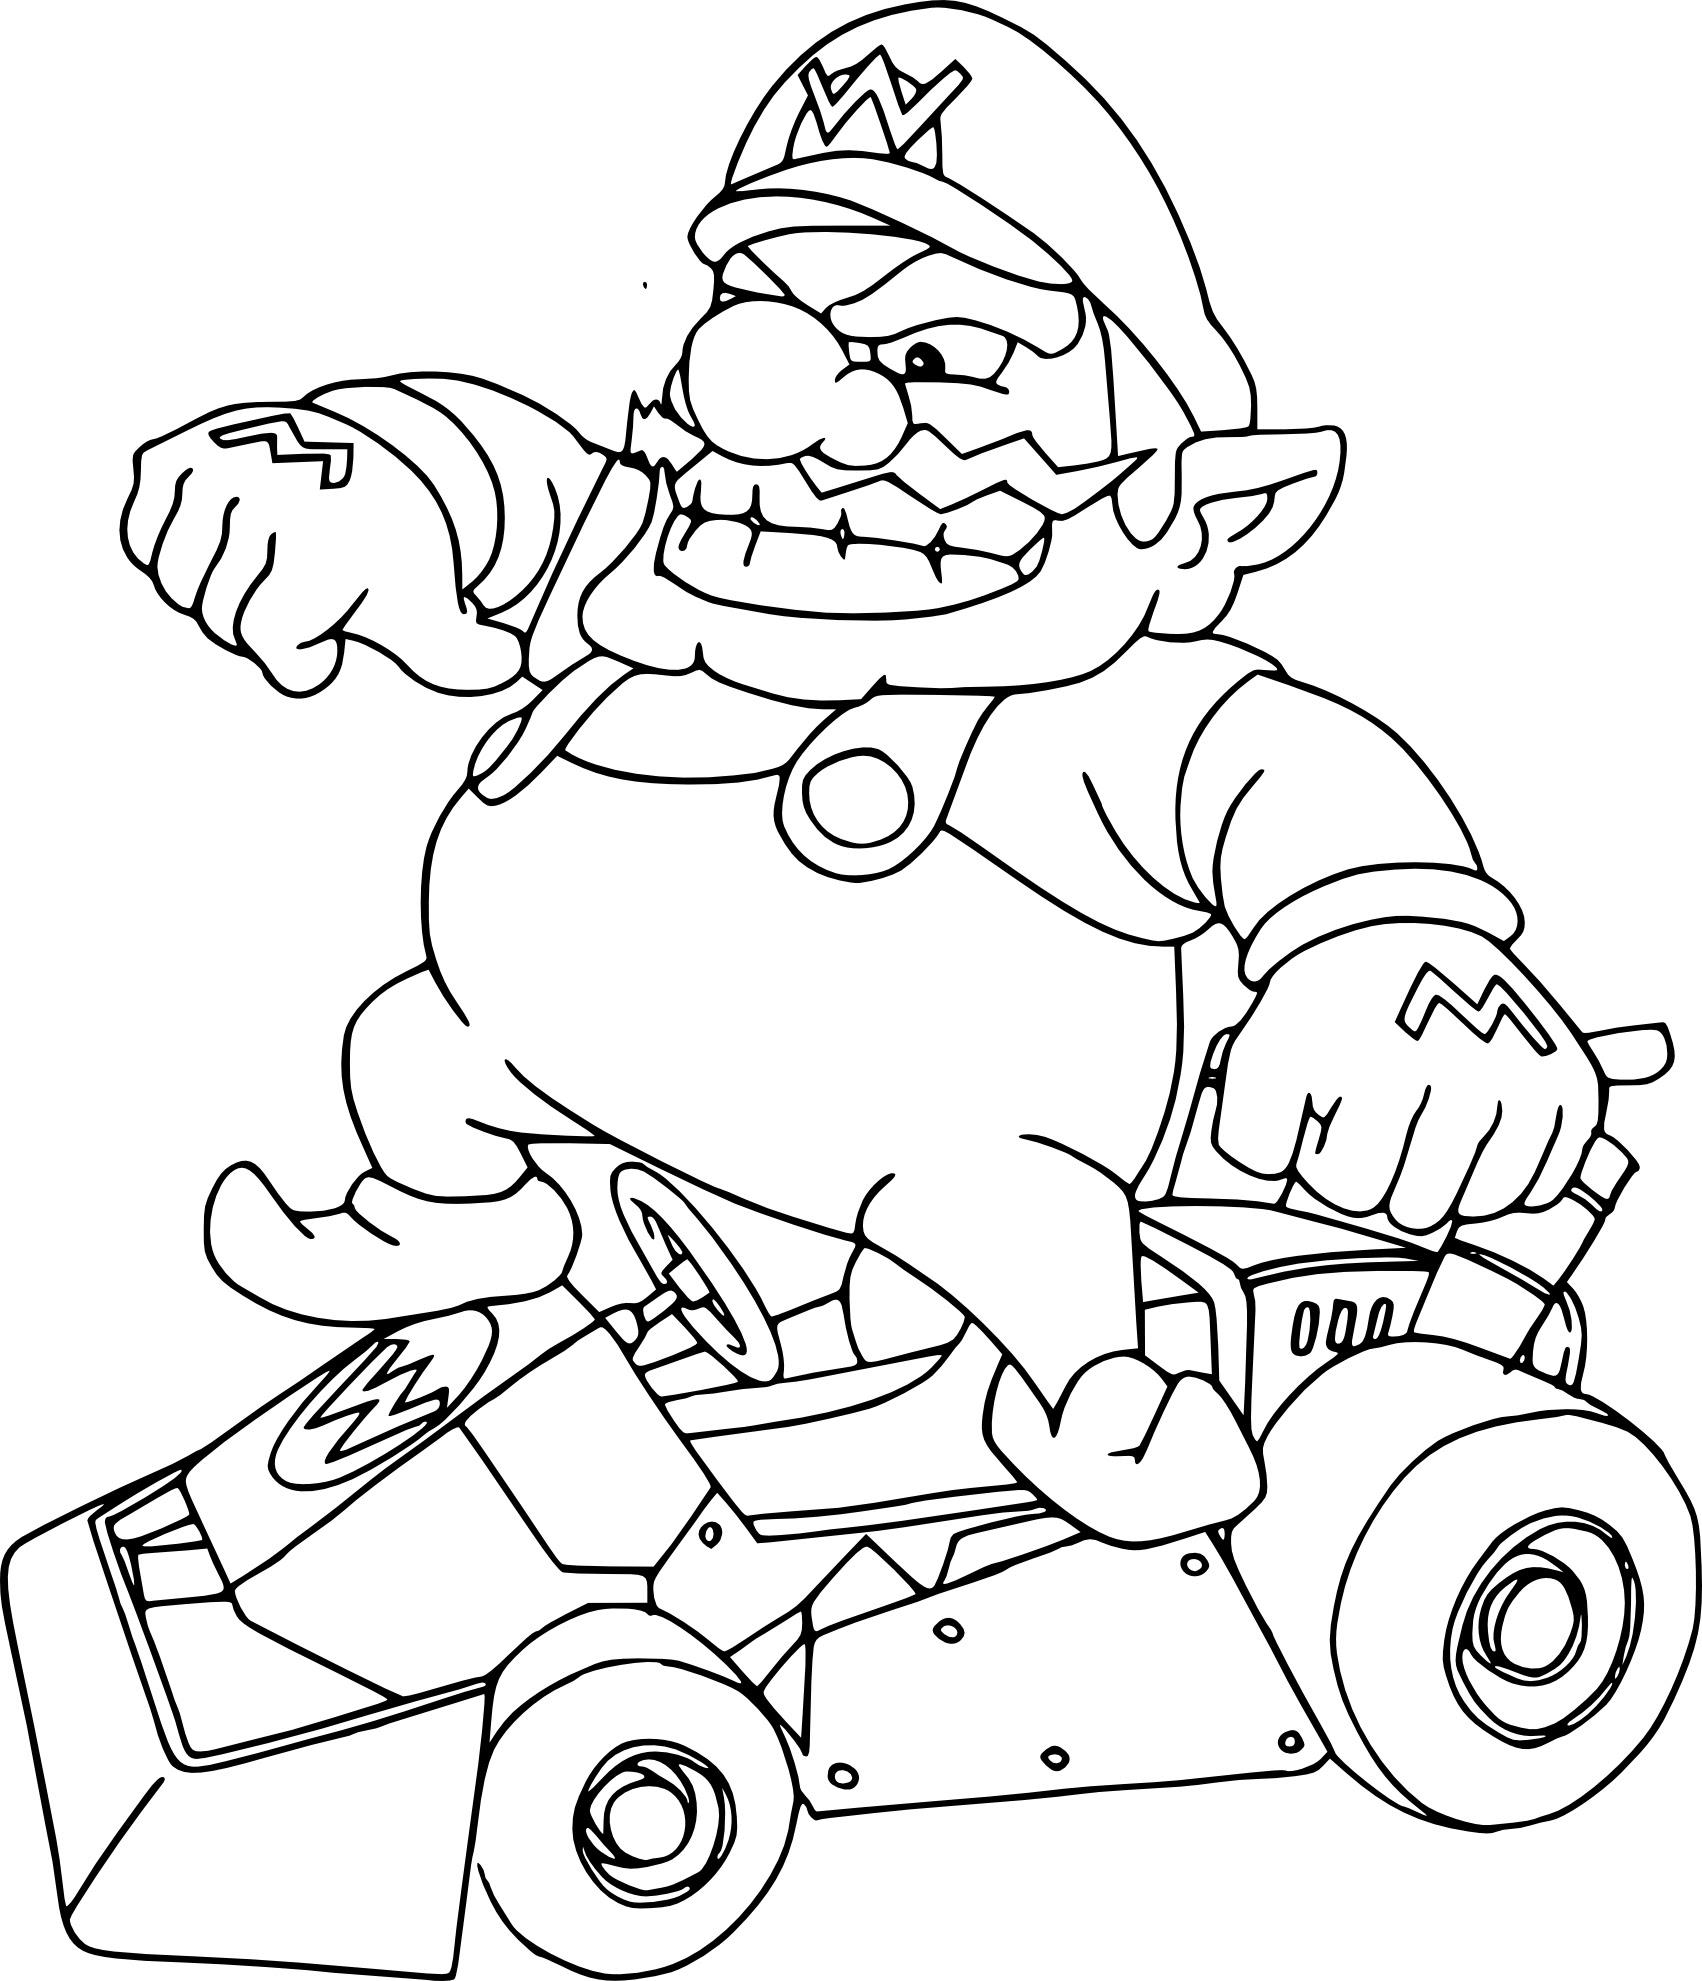 Coloriage Wario Mario Kart à Imprimer